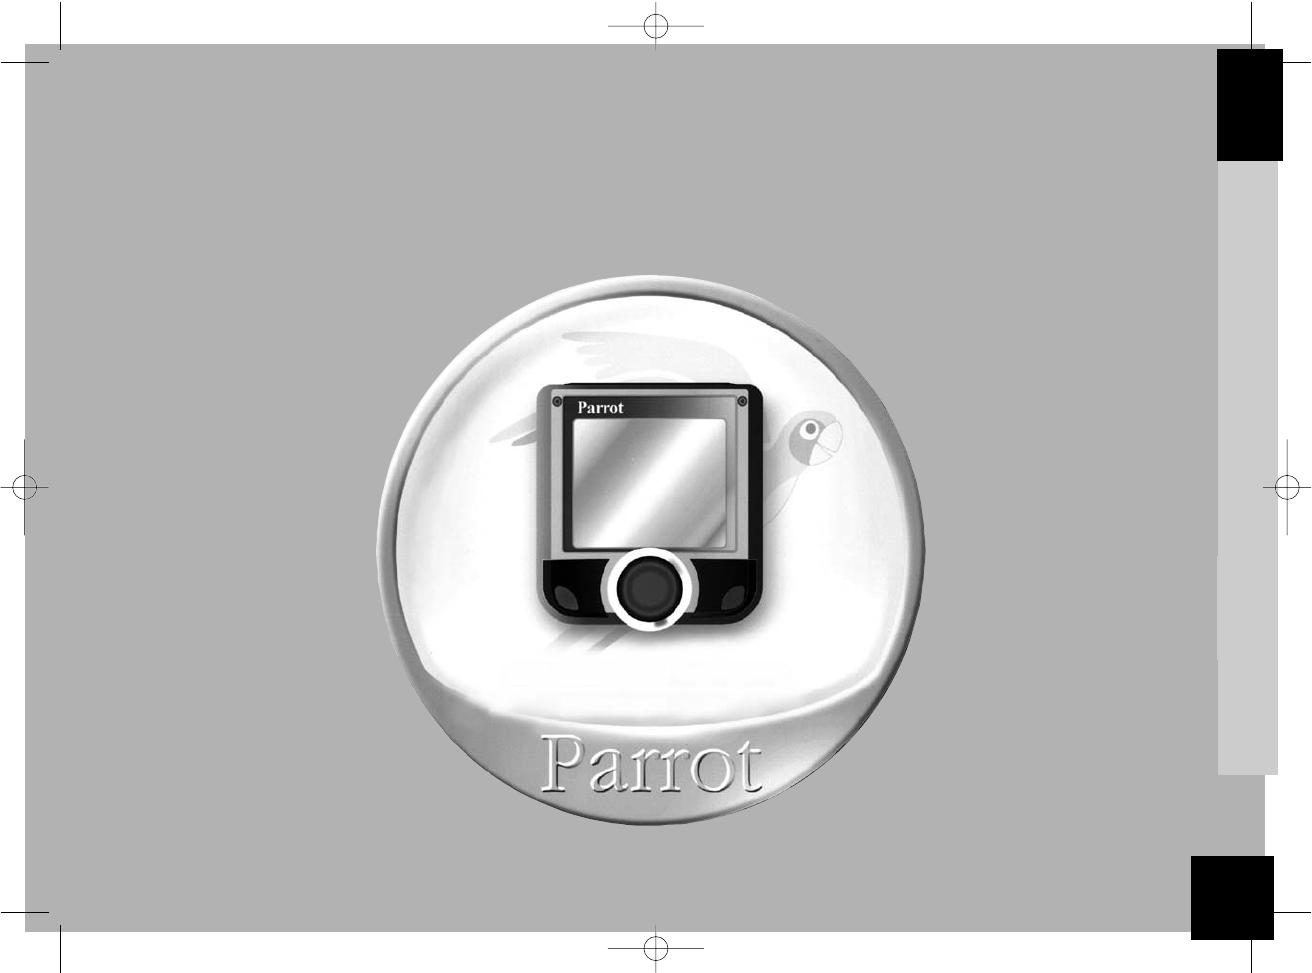 Parrot 3200 Ls Firmware Update